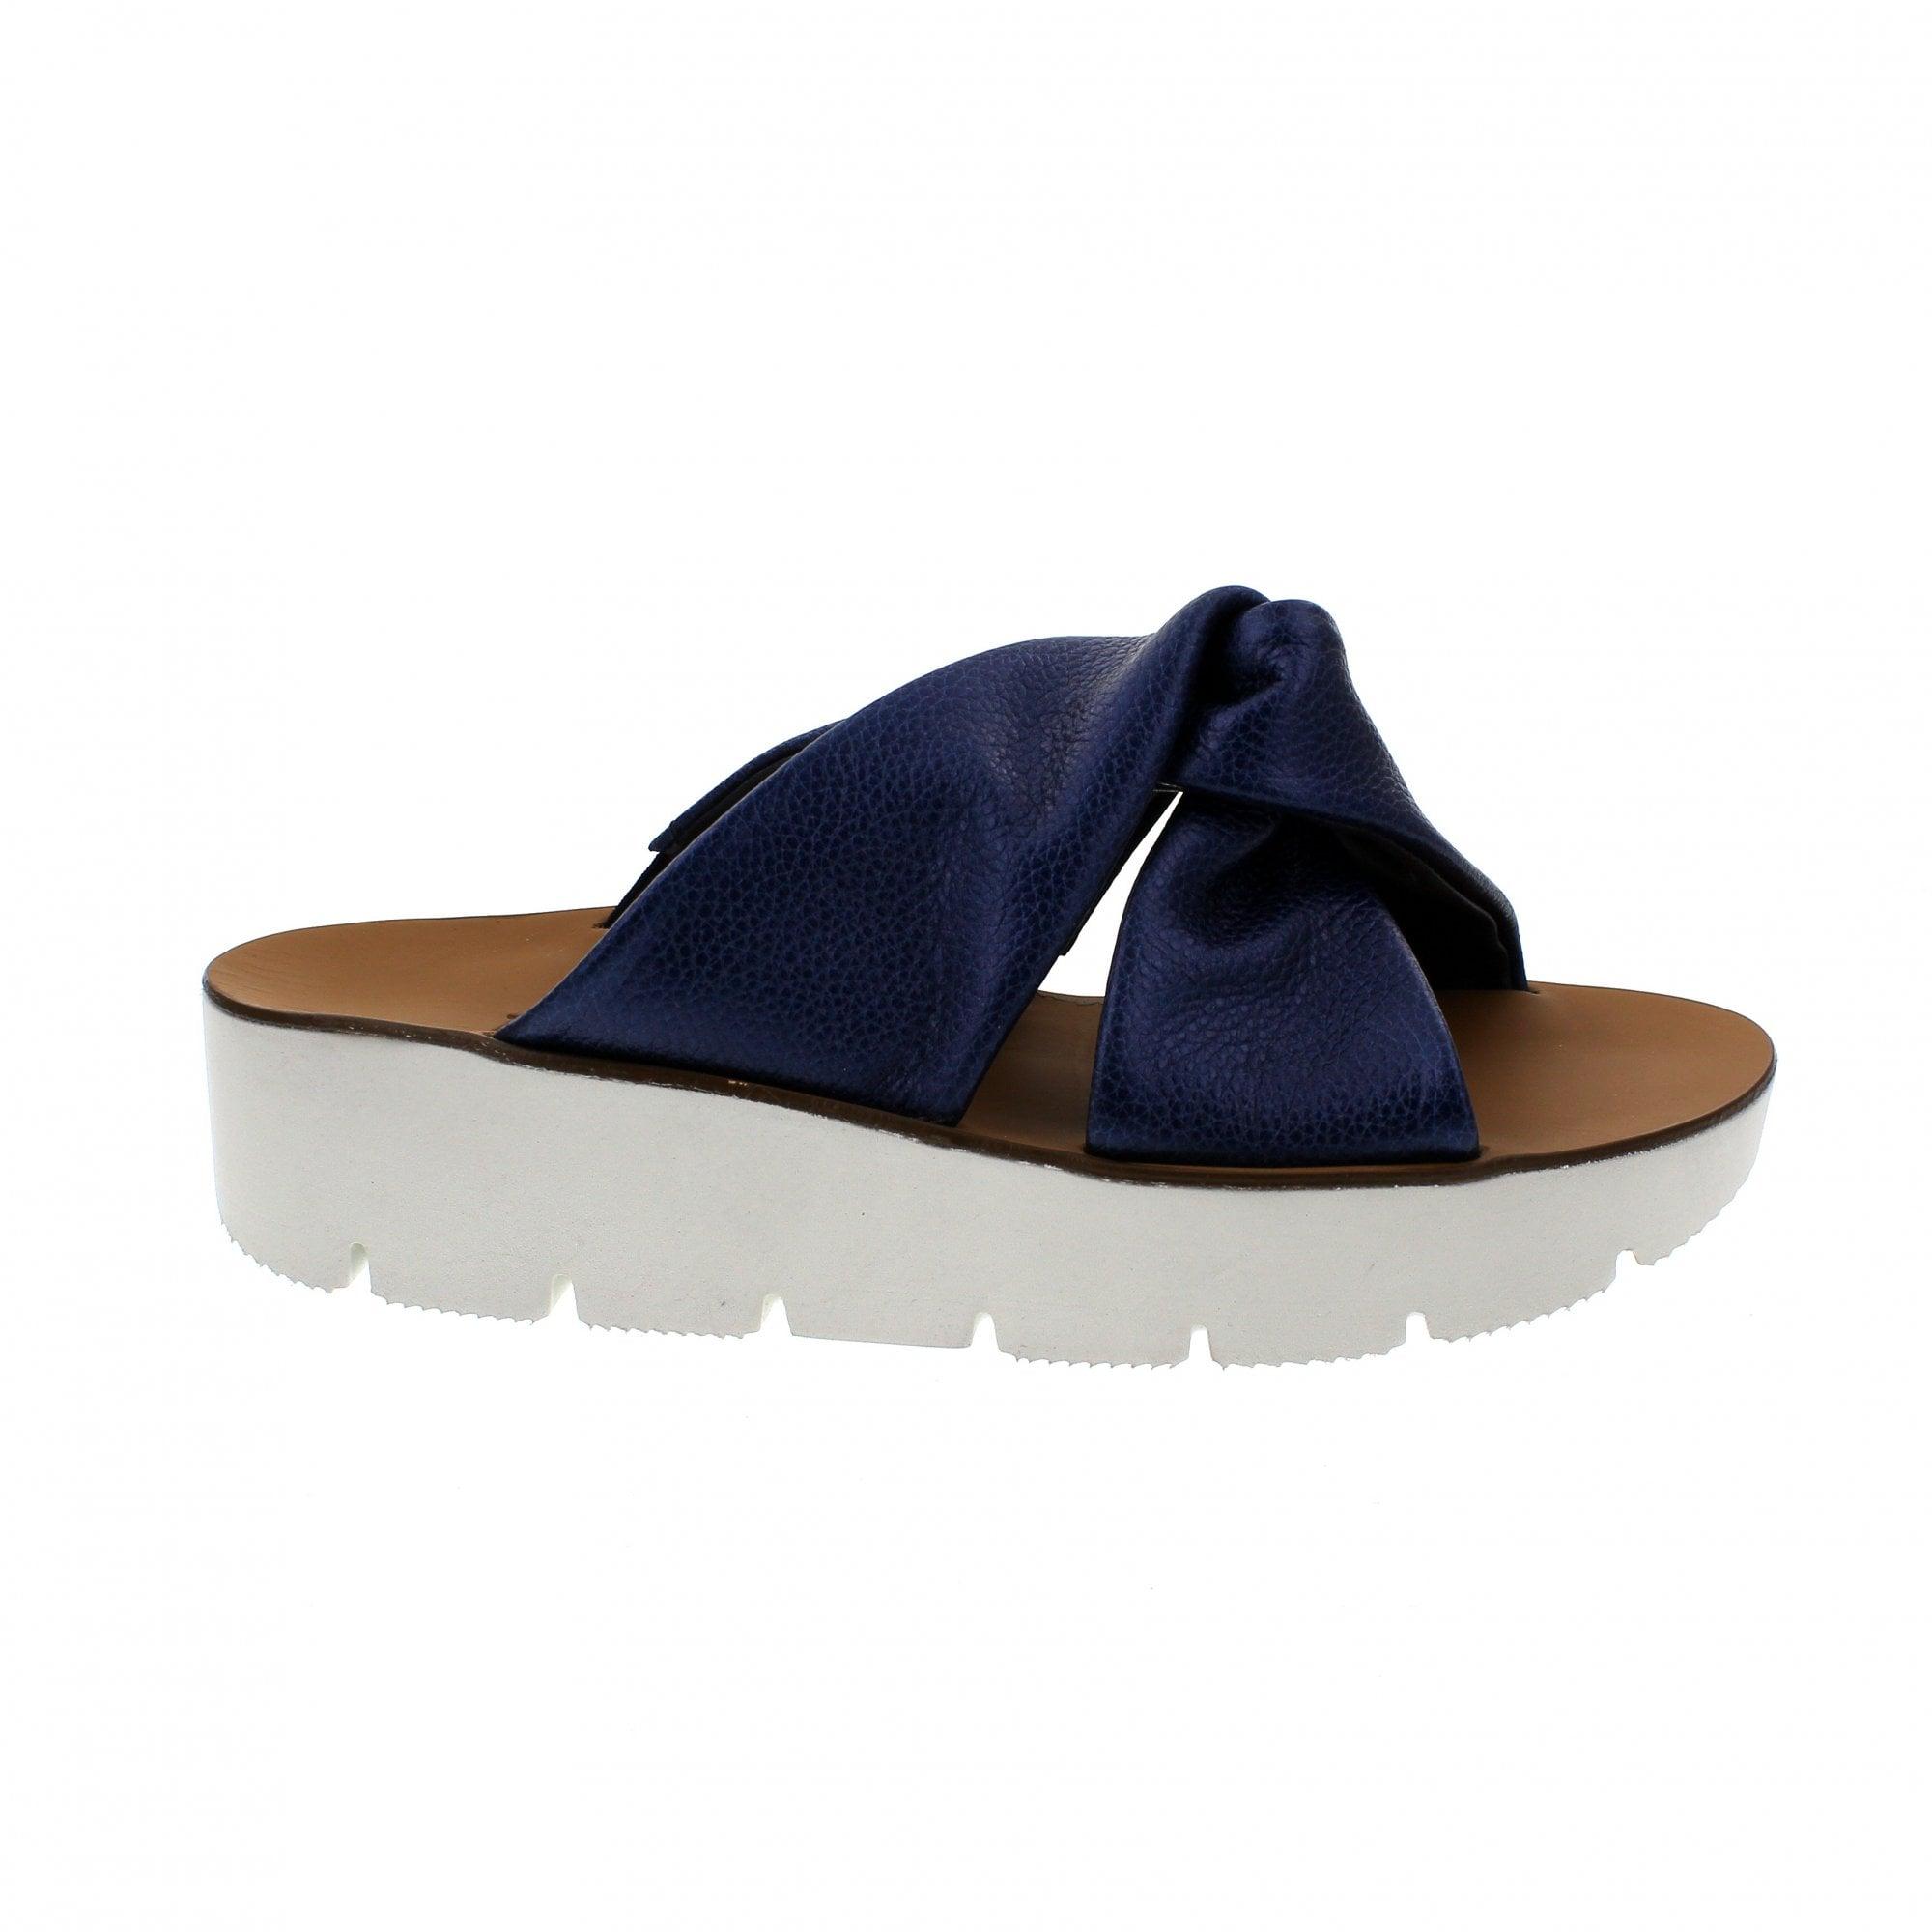 best sneakers 7e1cc 38719 Paul Green 7474-044 Navy Metallic Mule Sandals   Rogerson Shoes